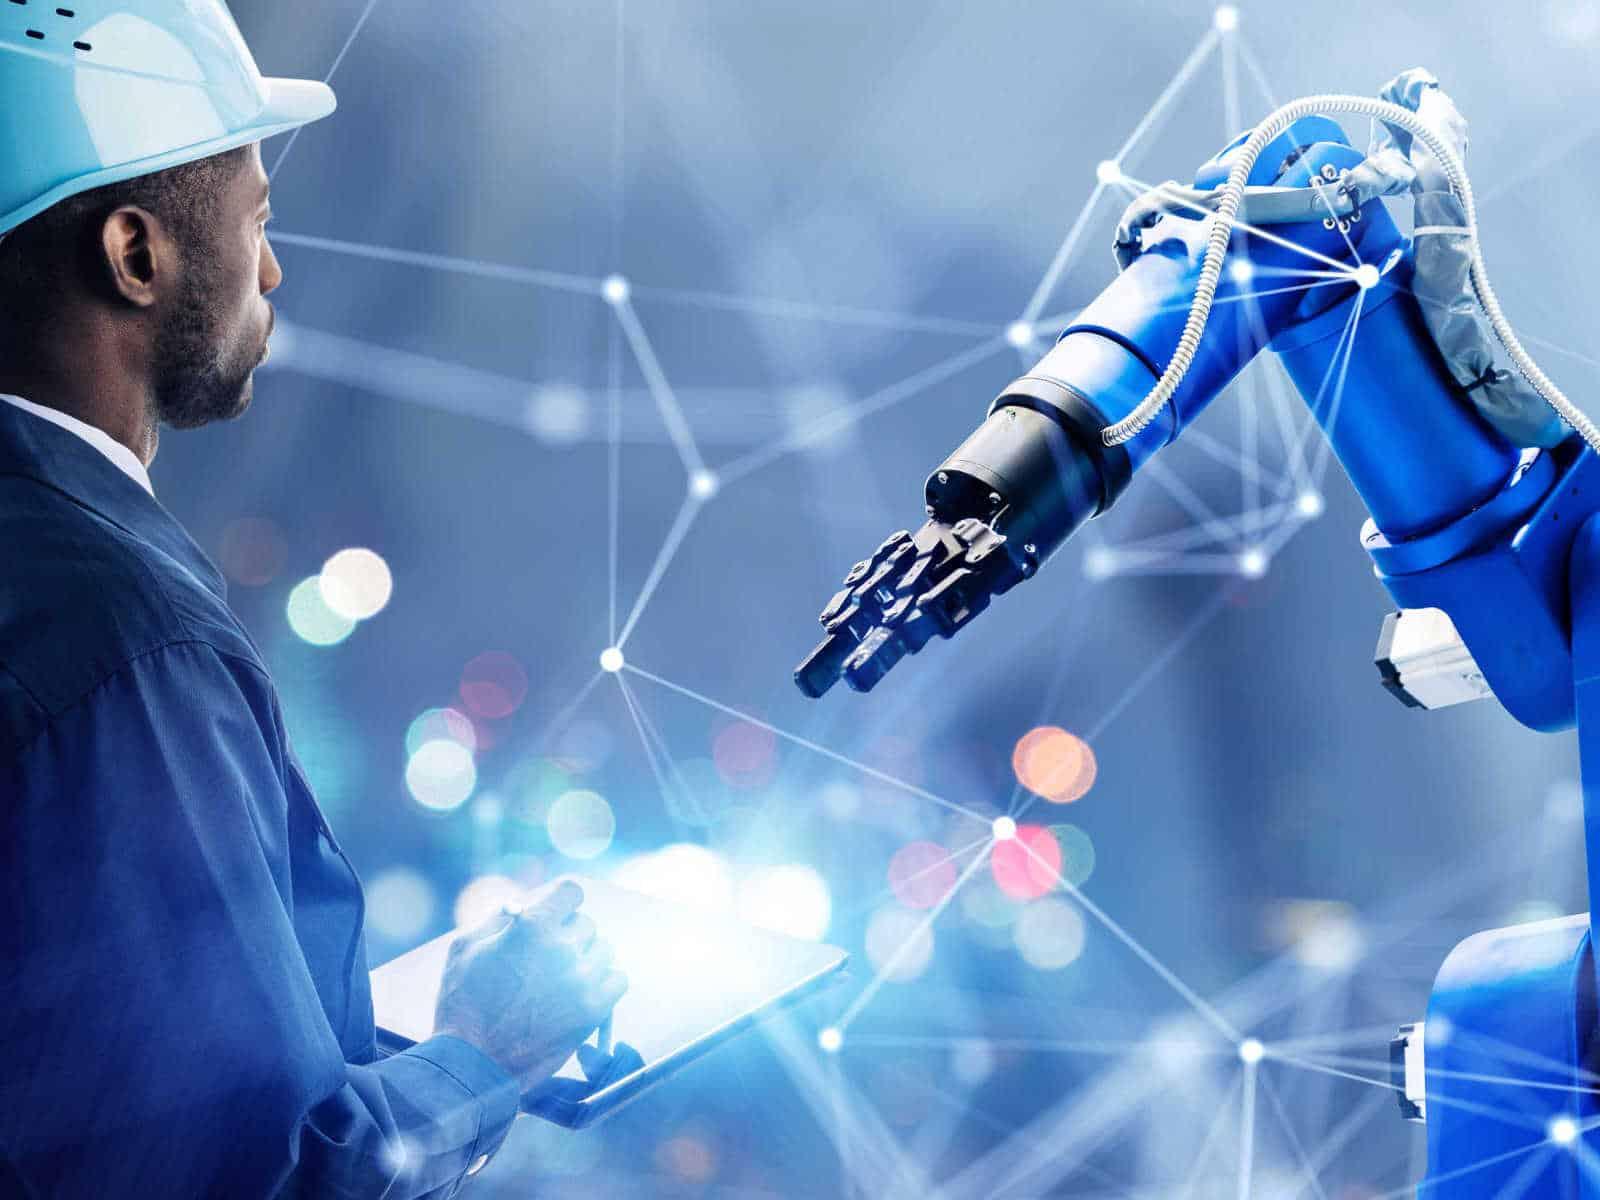 Industria 4.0: qual è la situazione in Italia?